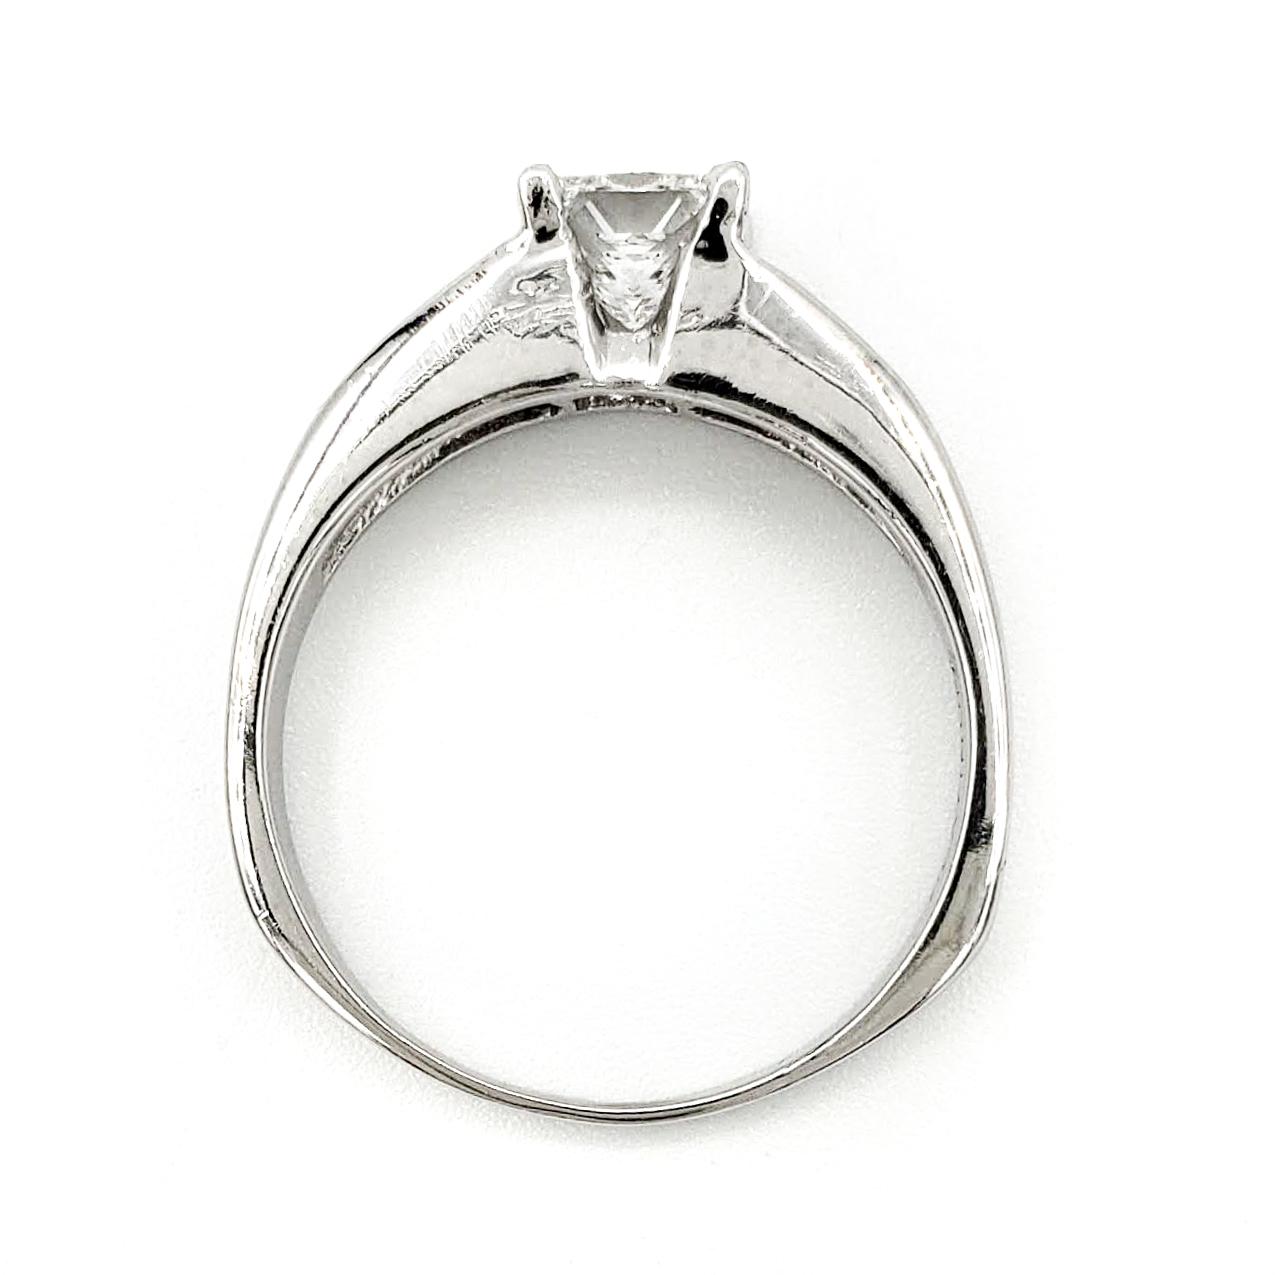 estate-platinum-engagement-ring-with-0-72-carat-princess-cut-diamond-gia-e-vs1